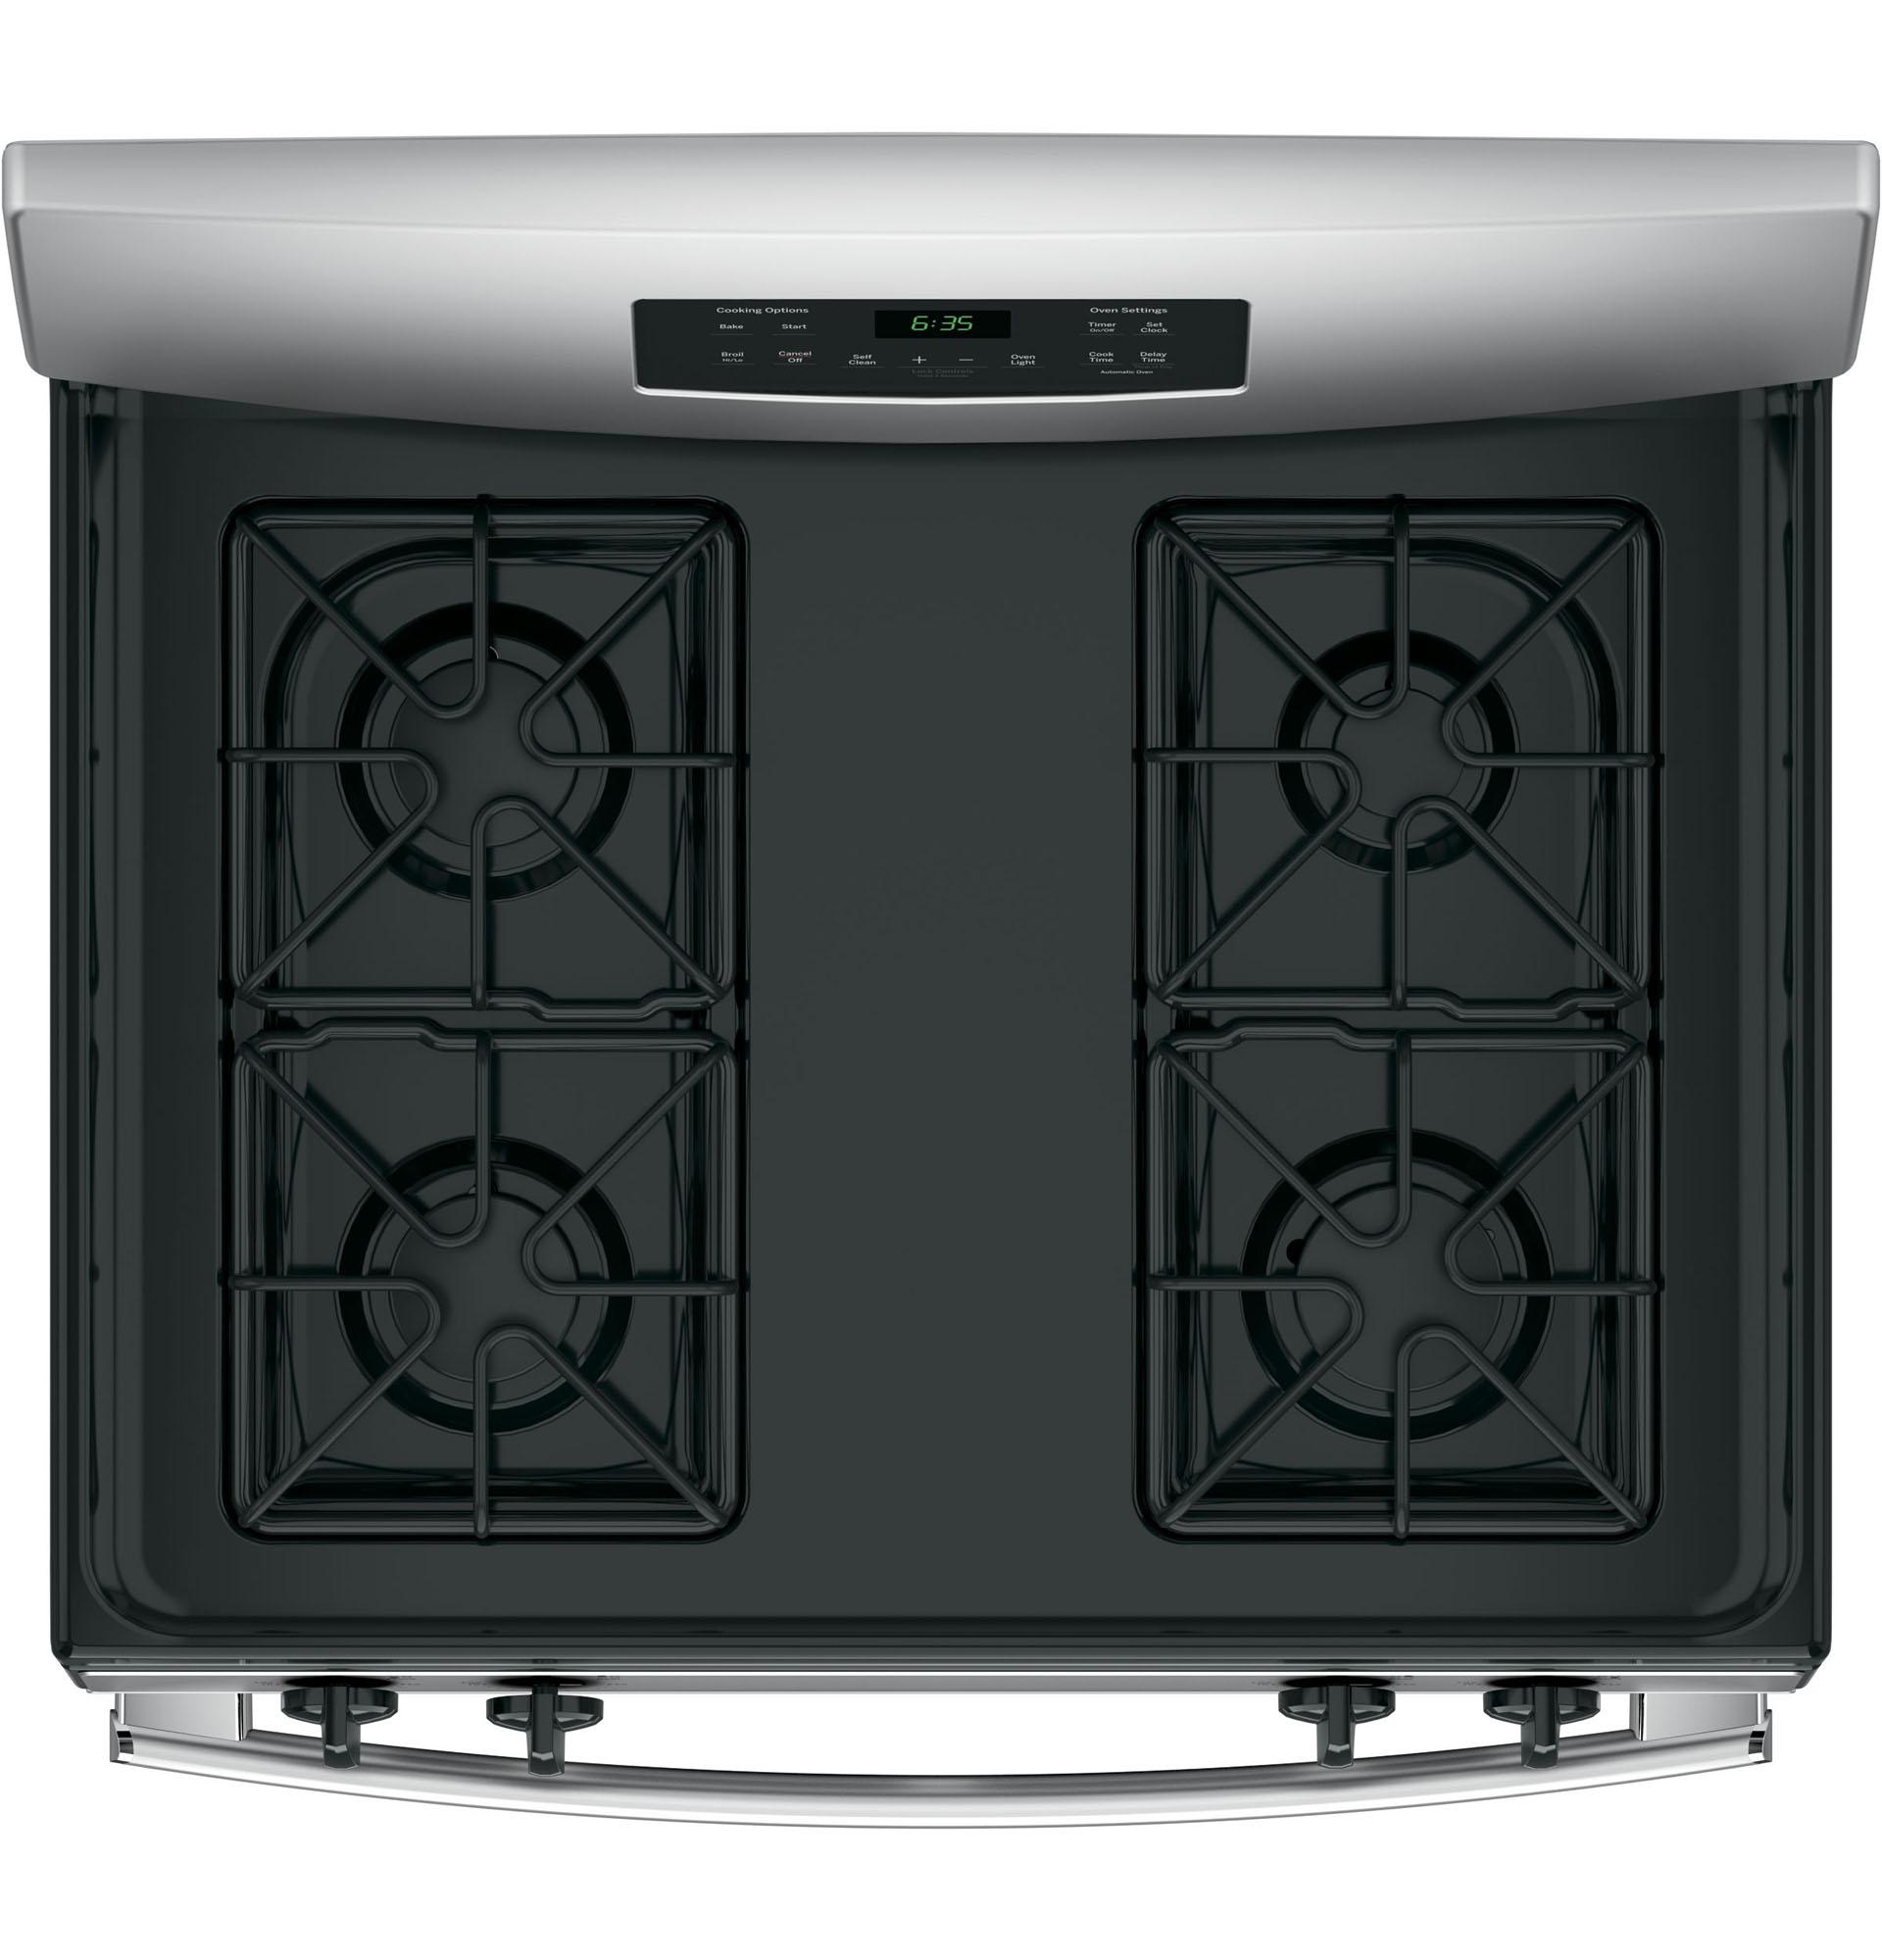 "GE Appliances JGB635REKSS 30"" Freestanding Gas Range - Stainless Steel"